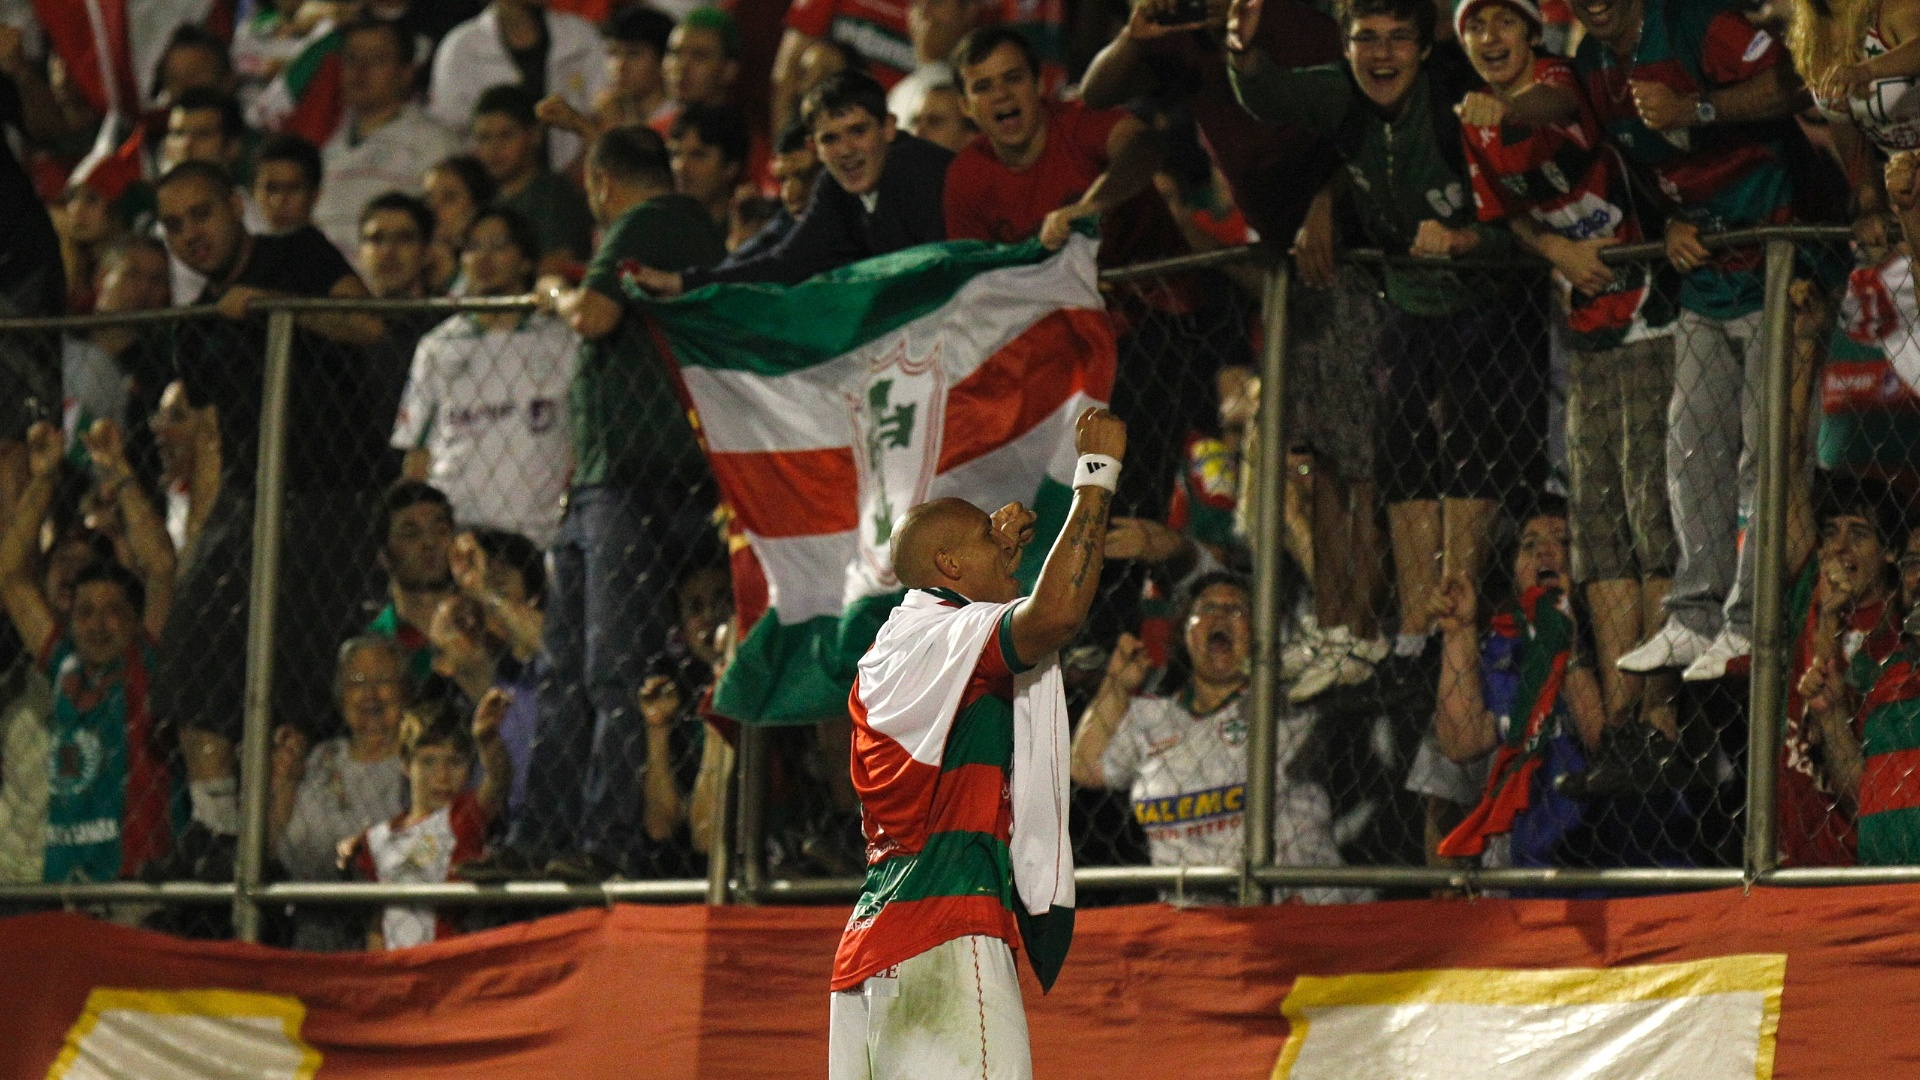 Edno carrega bandeira da Portuguesa e comemora título da Série B perto dos torcedores no Canindé